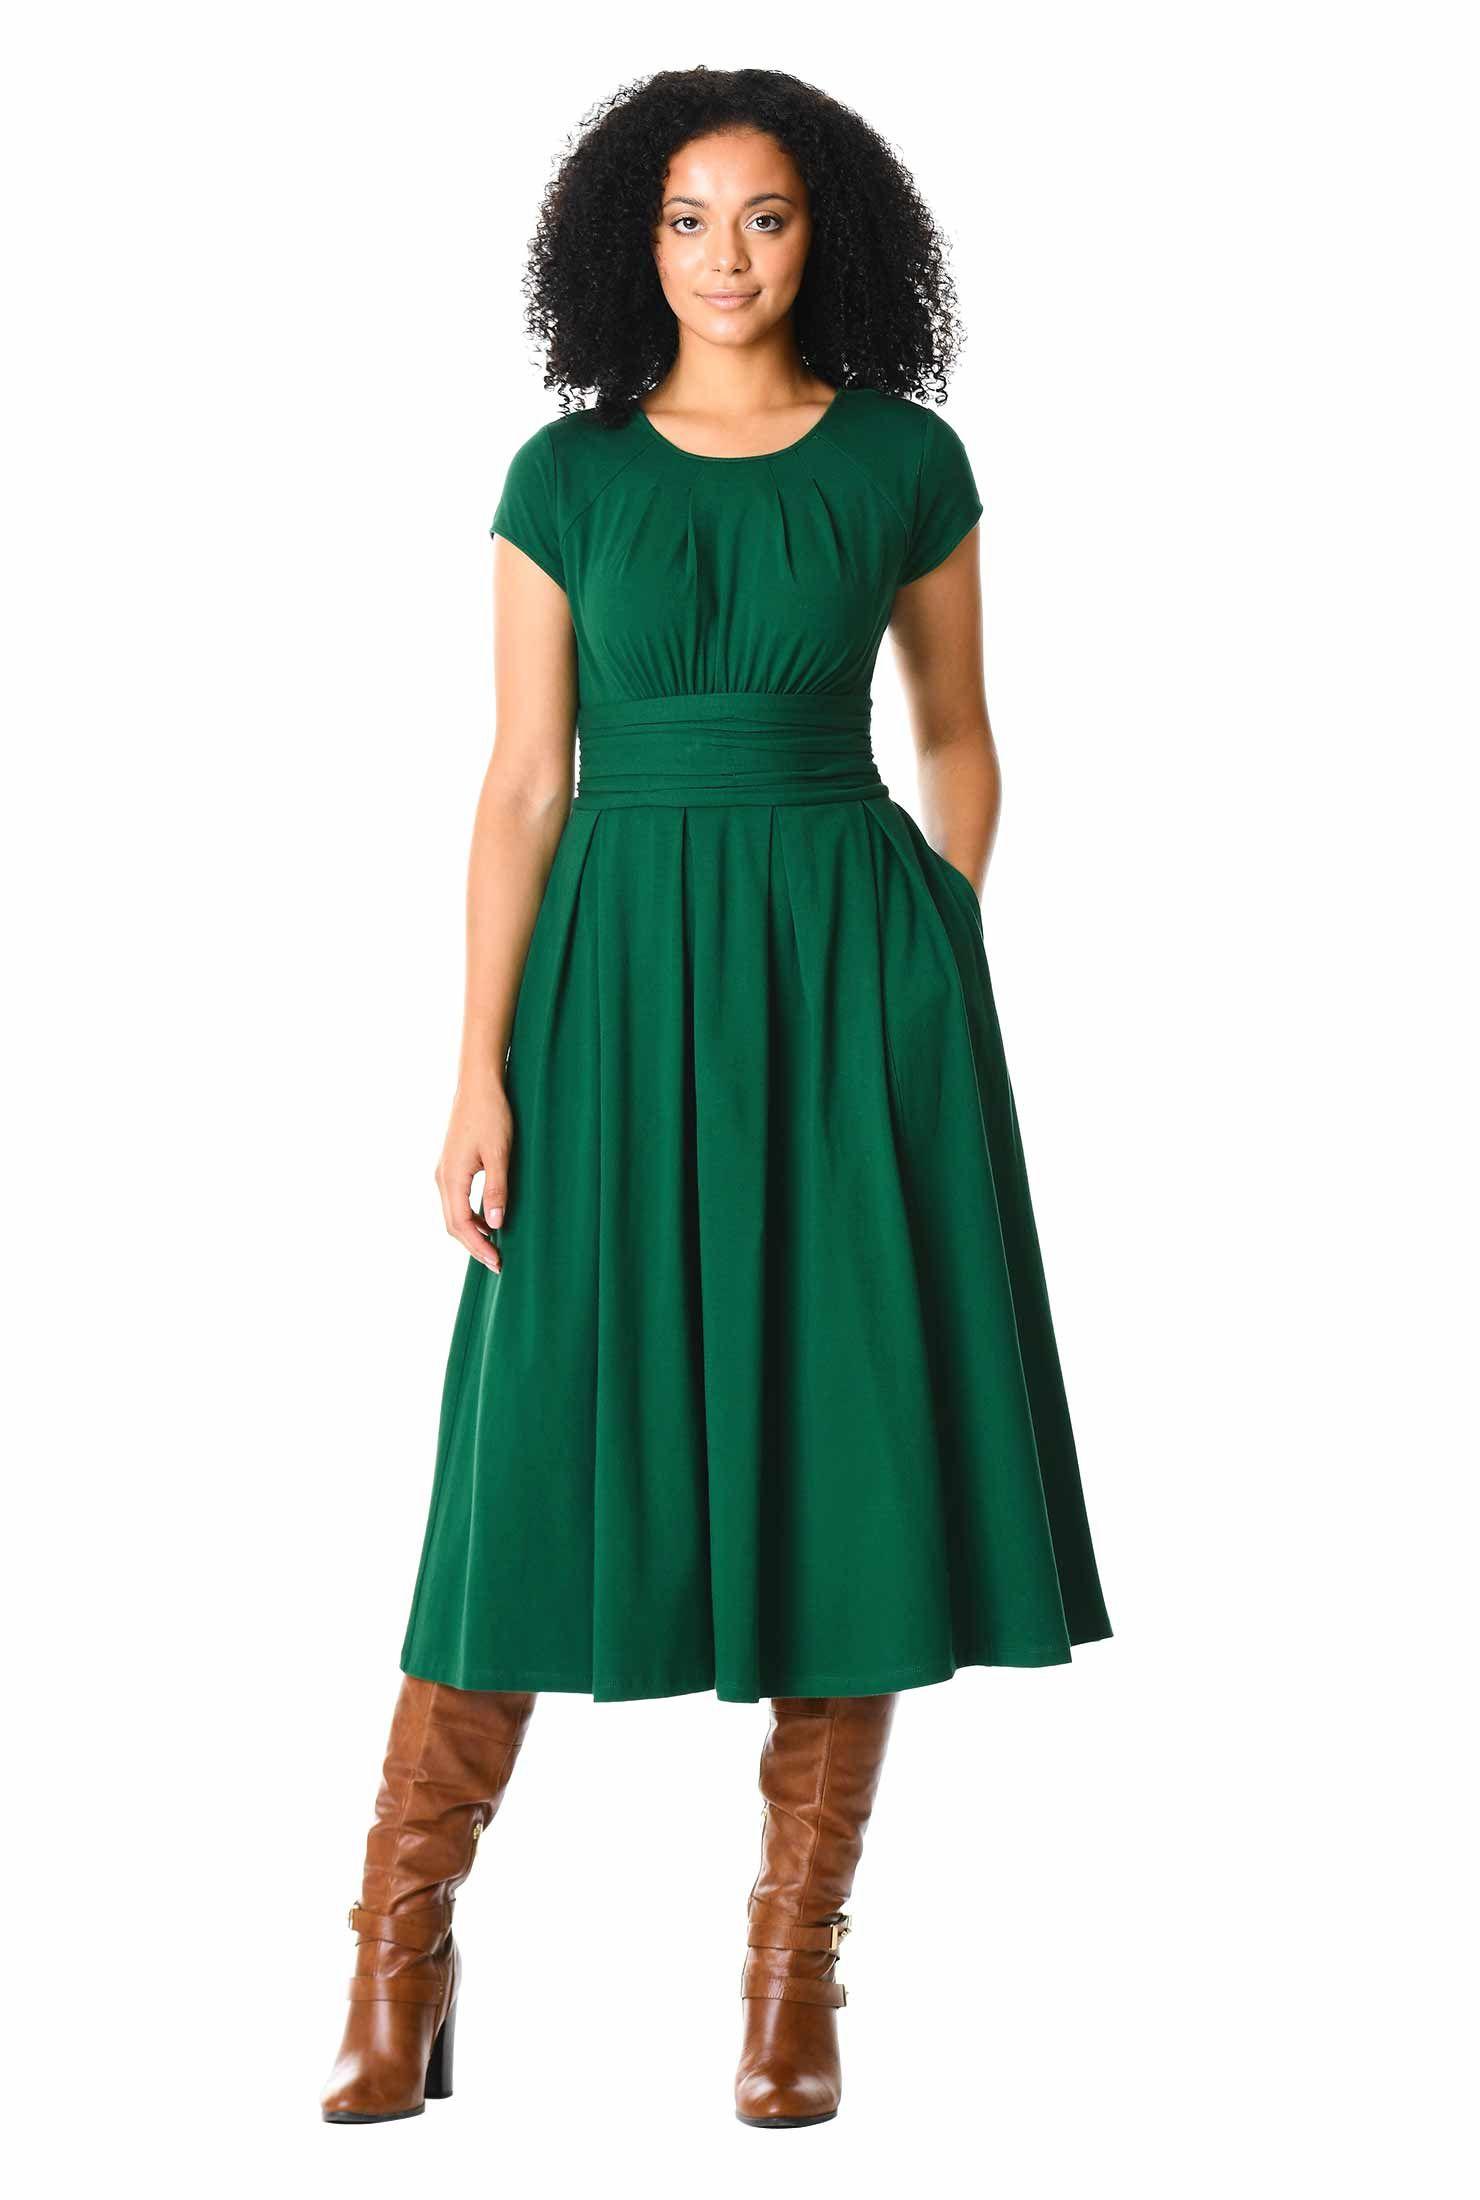 Womens Sundresses Summer Sun Dresses For Women Online White Long Plus Size Petite Missy Tall Cotton S Fashion Clothes Women Dresses Green Knit Dress [ 2200 x 1480 Pixel ]